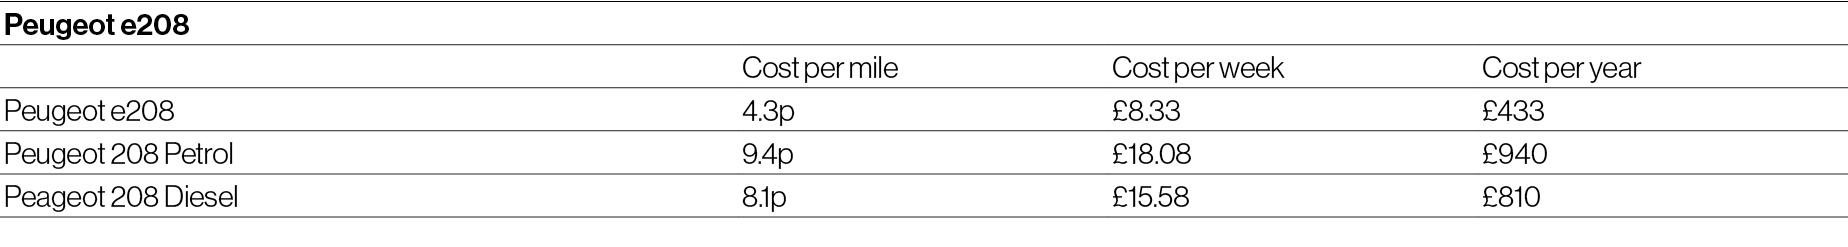 Cost of running e208 car